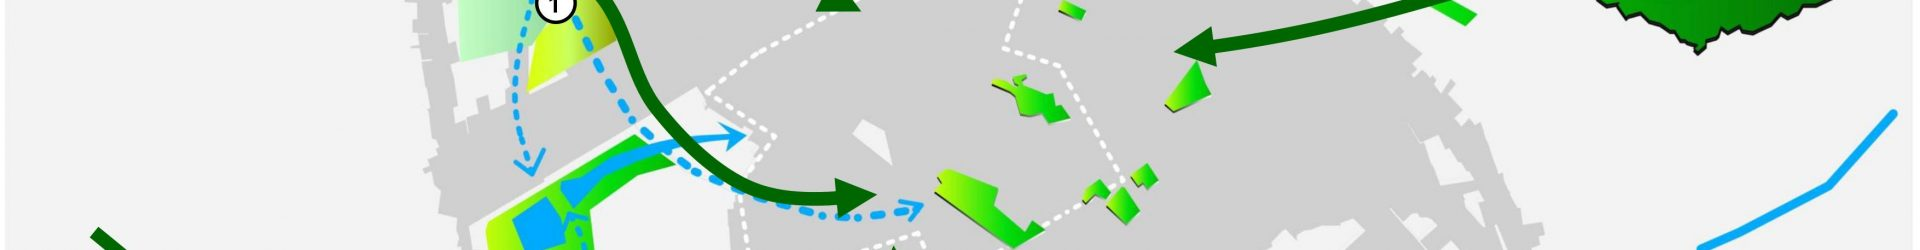 Groenklimaatassen en groene lobben